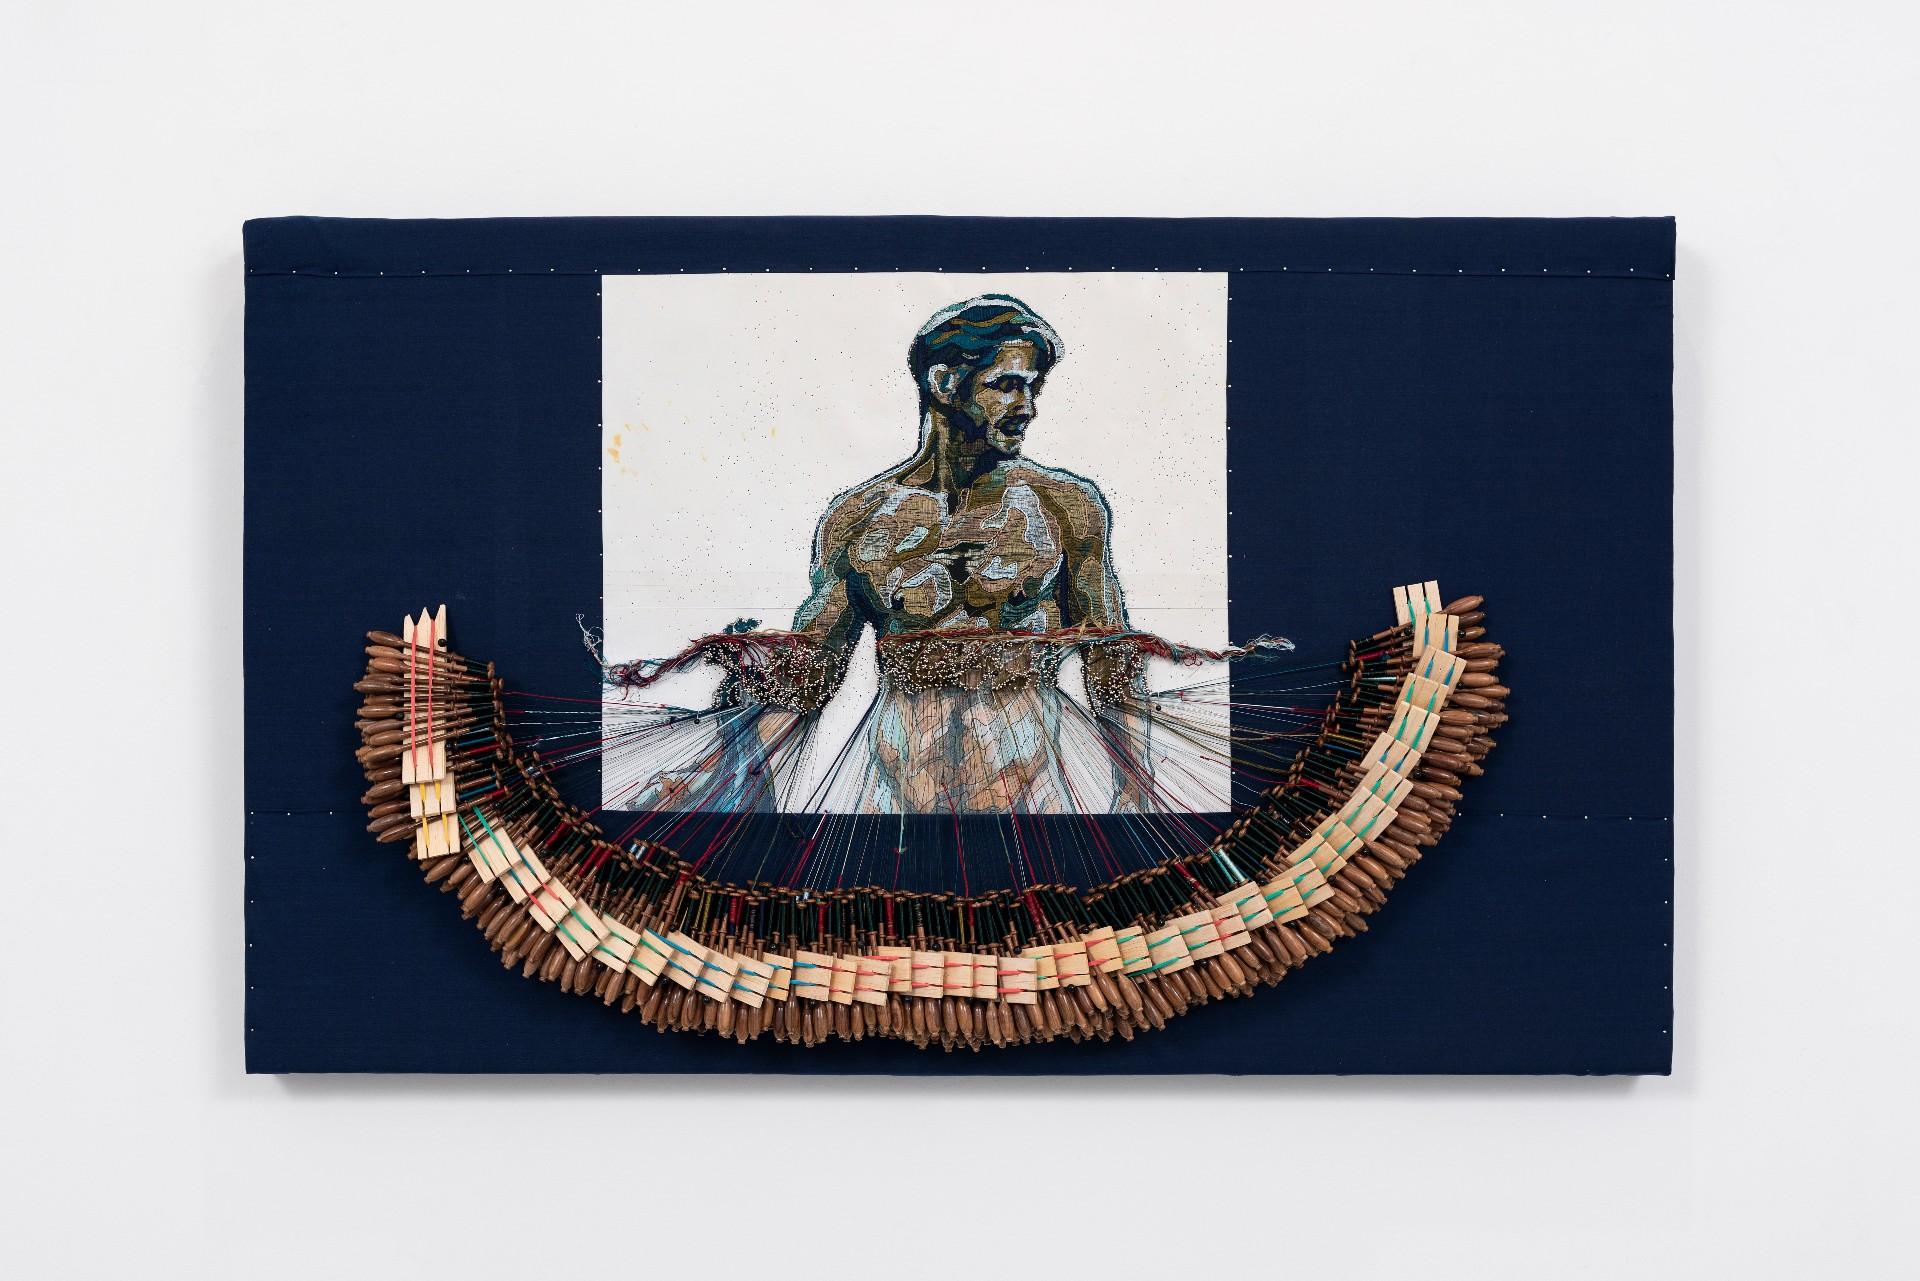 Pierre Fouche, The Little Binche Peacock and Other Utopian Dreams 2019, (detail), acrylic cord bobbin lace, silk floss bobbin lace, wooden lace bobbins.